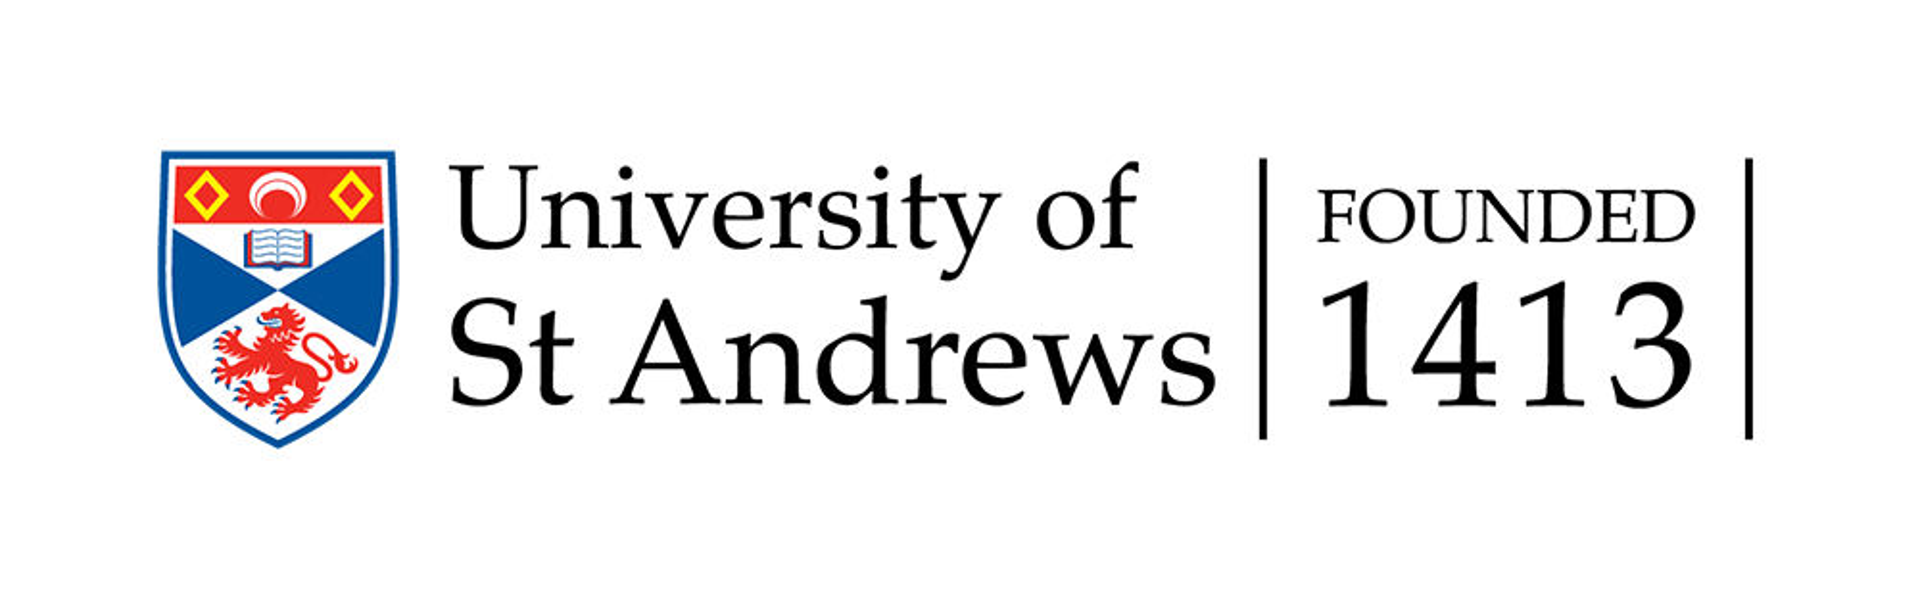 Logo 1441209900.png?ixlib=rb 1.1